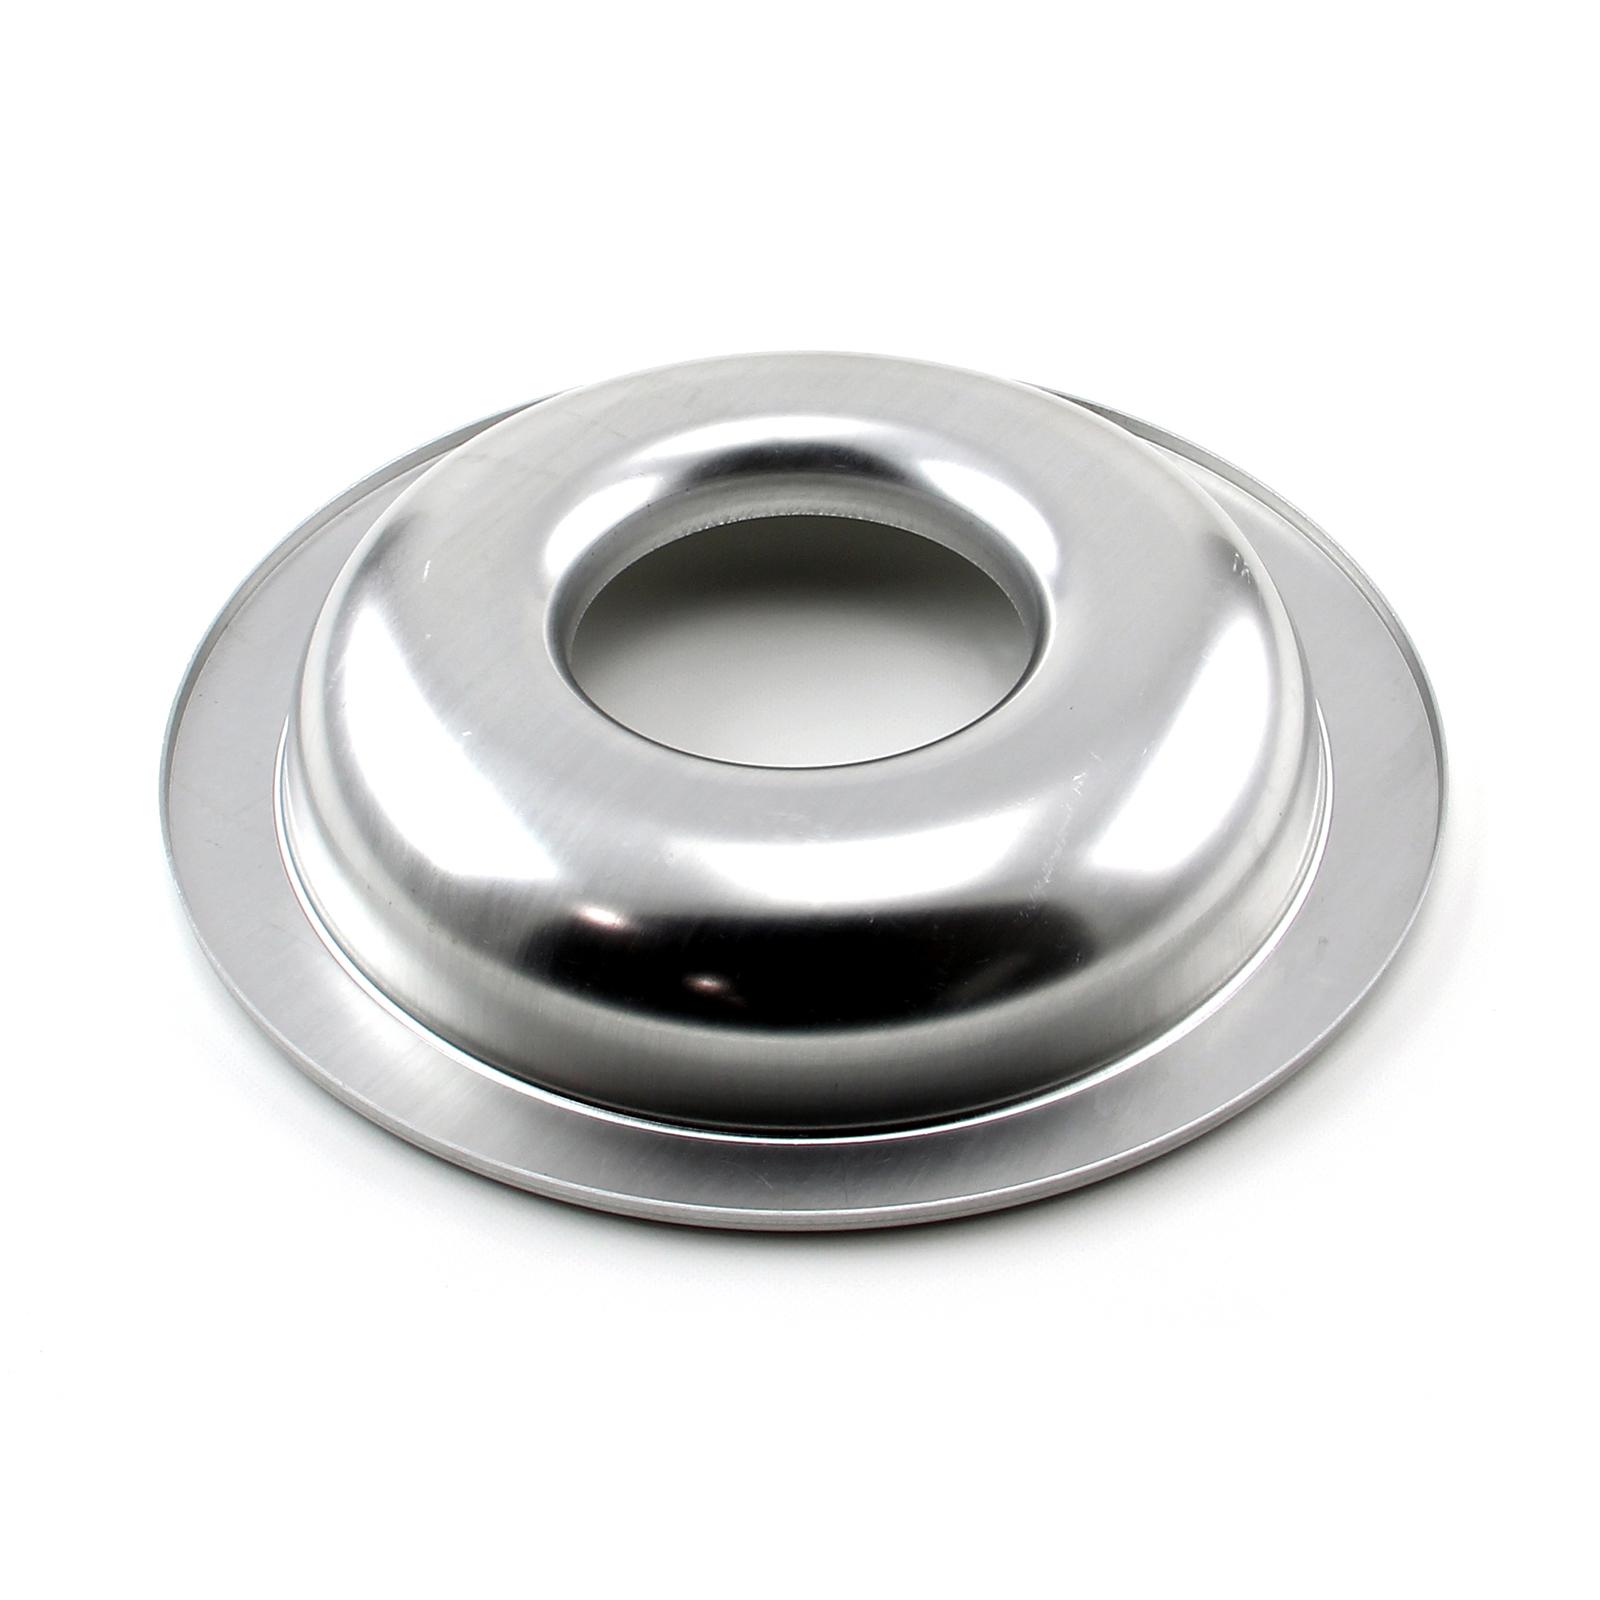 "PCE® PCE101.1005 14"" Aluminum Drop Recessed Air Cleaner Base"